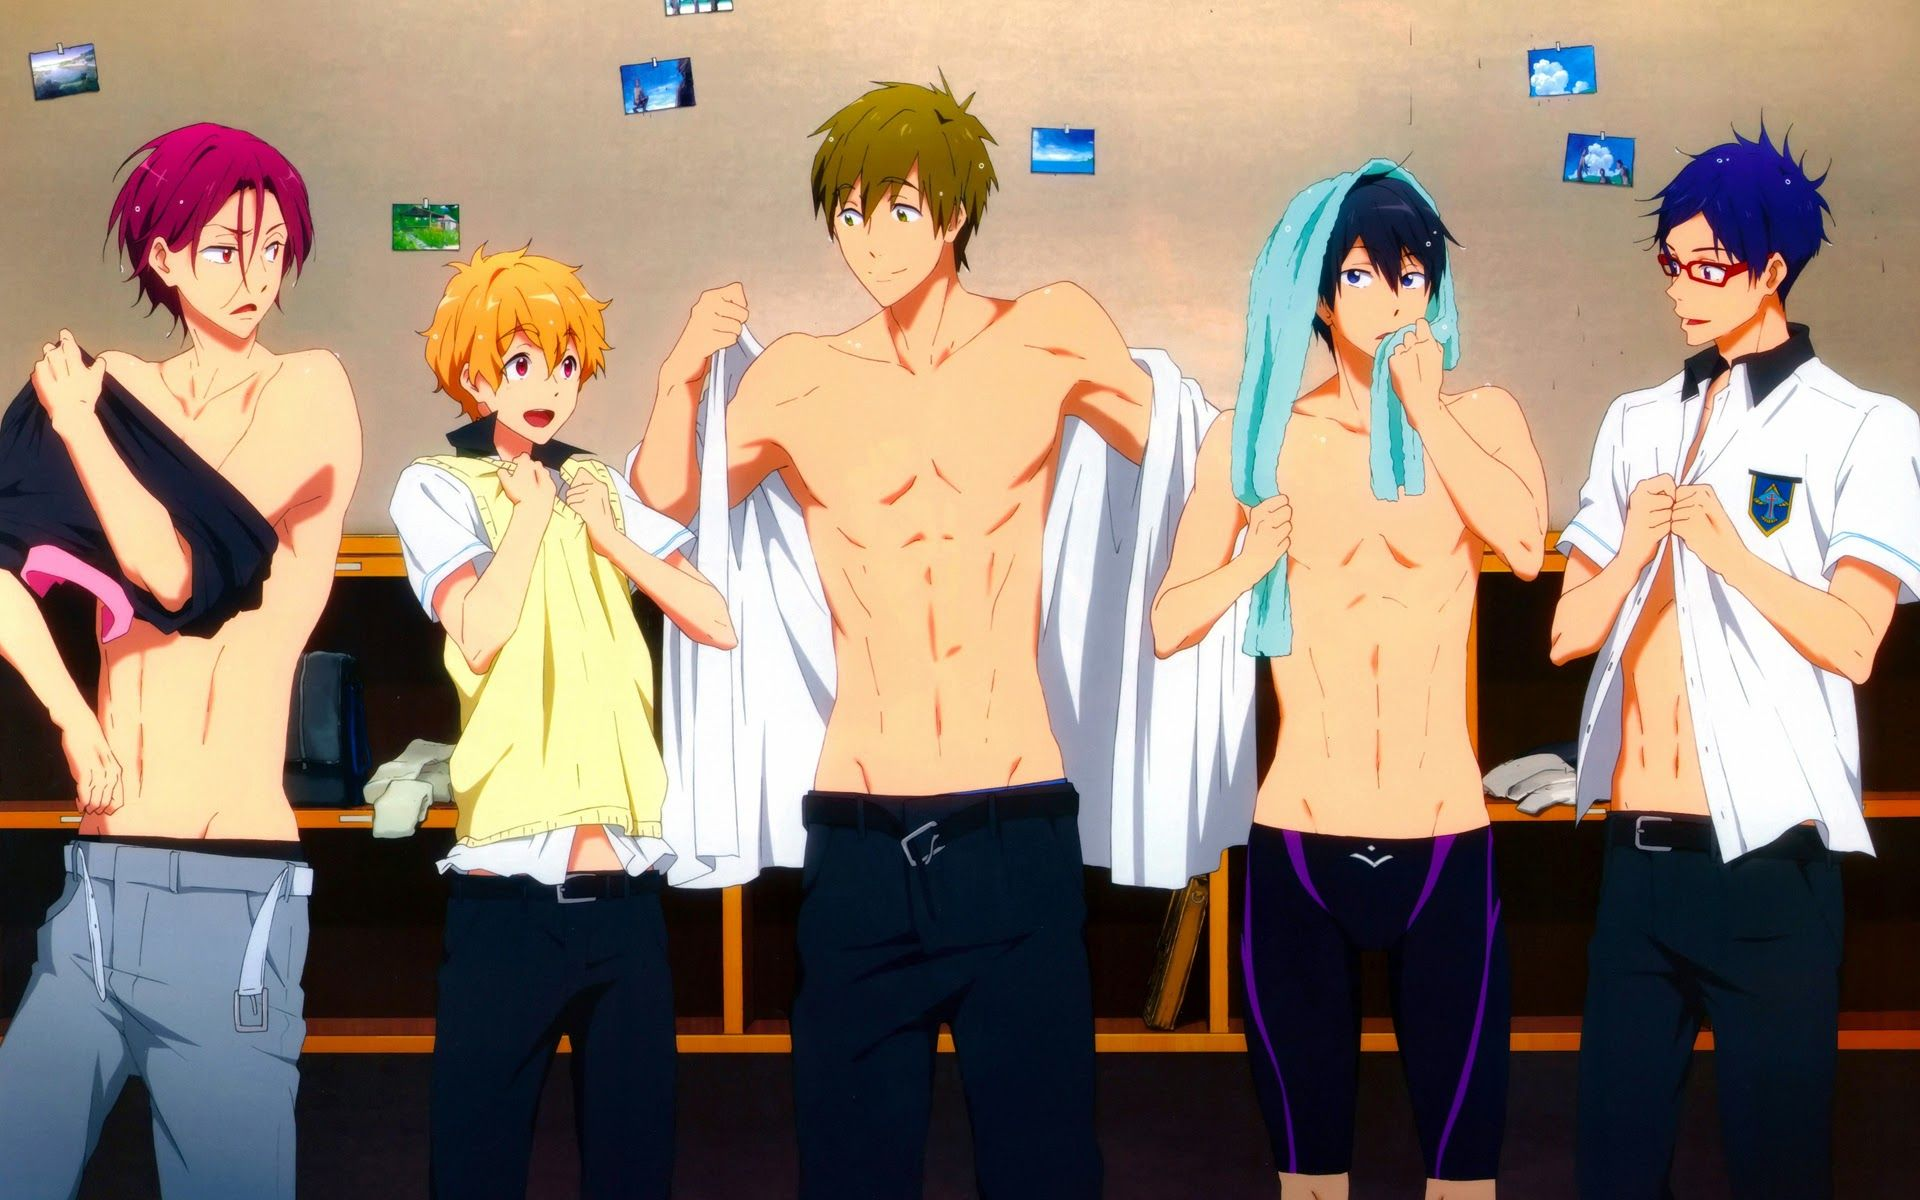 Anime boy sixpack